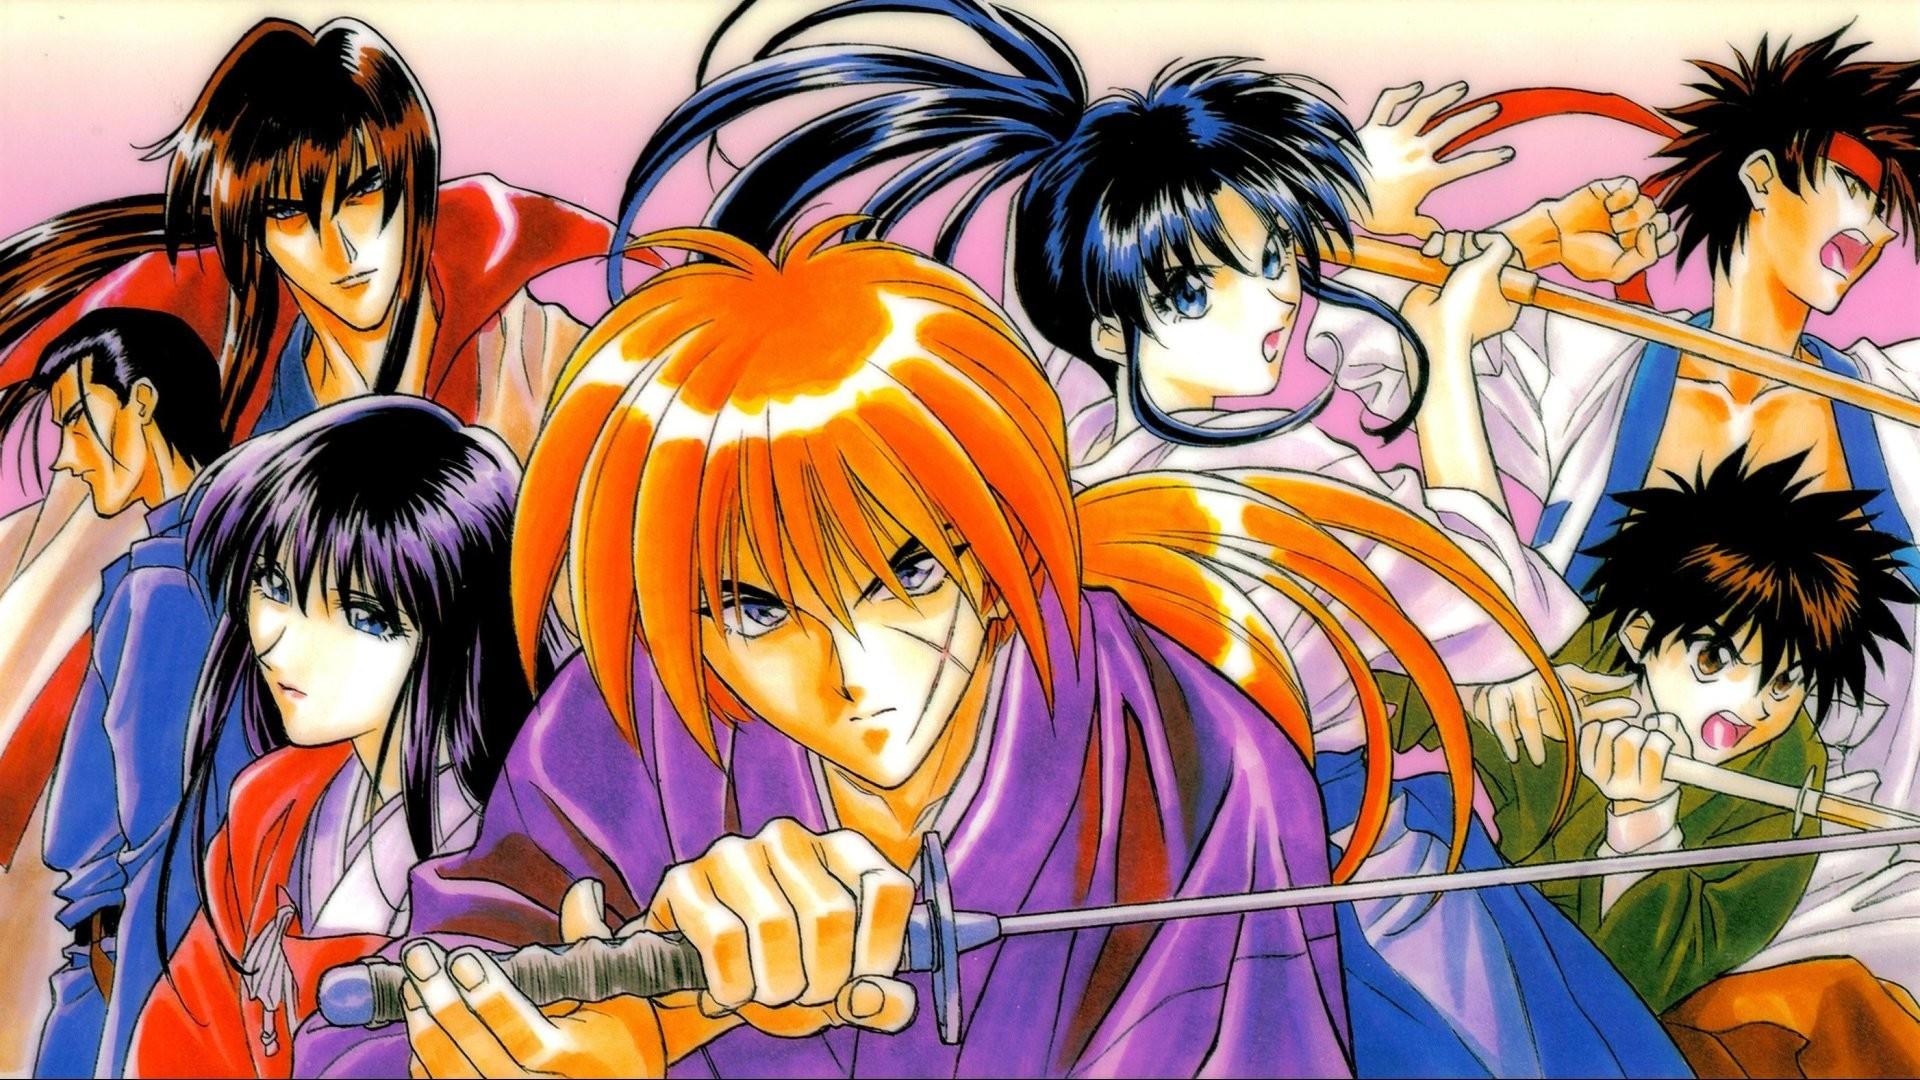 Download now full hd wallpaper rurouni kenshin samurai warrior …